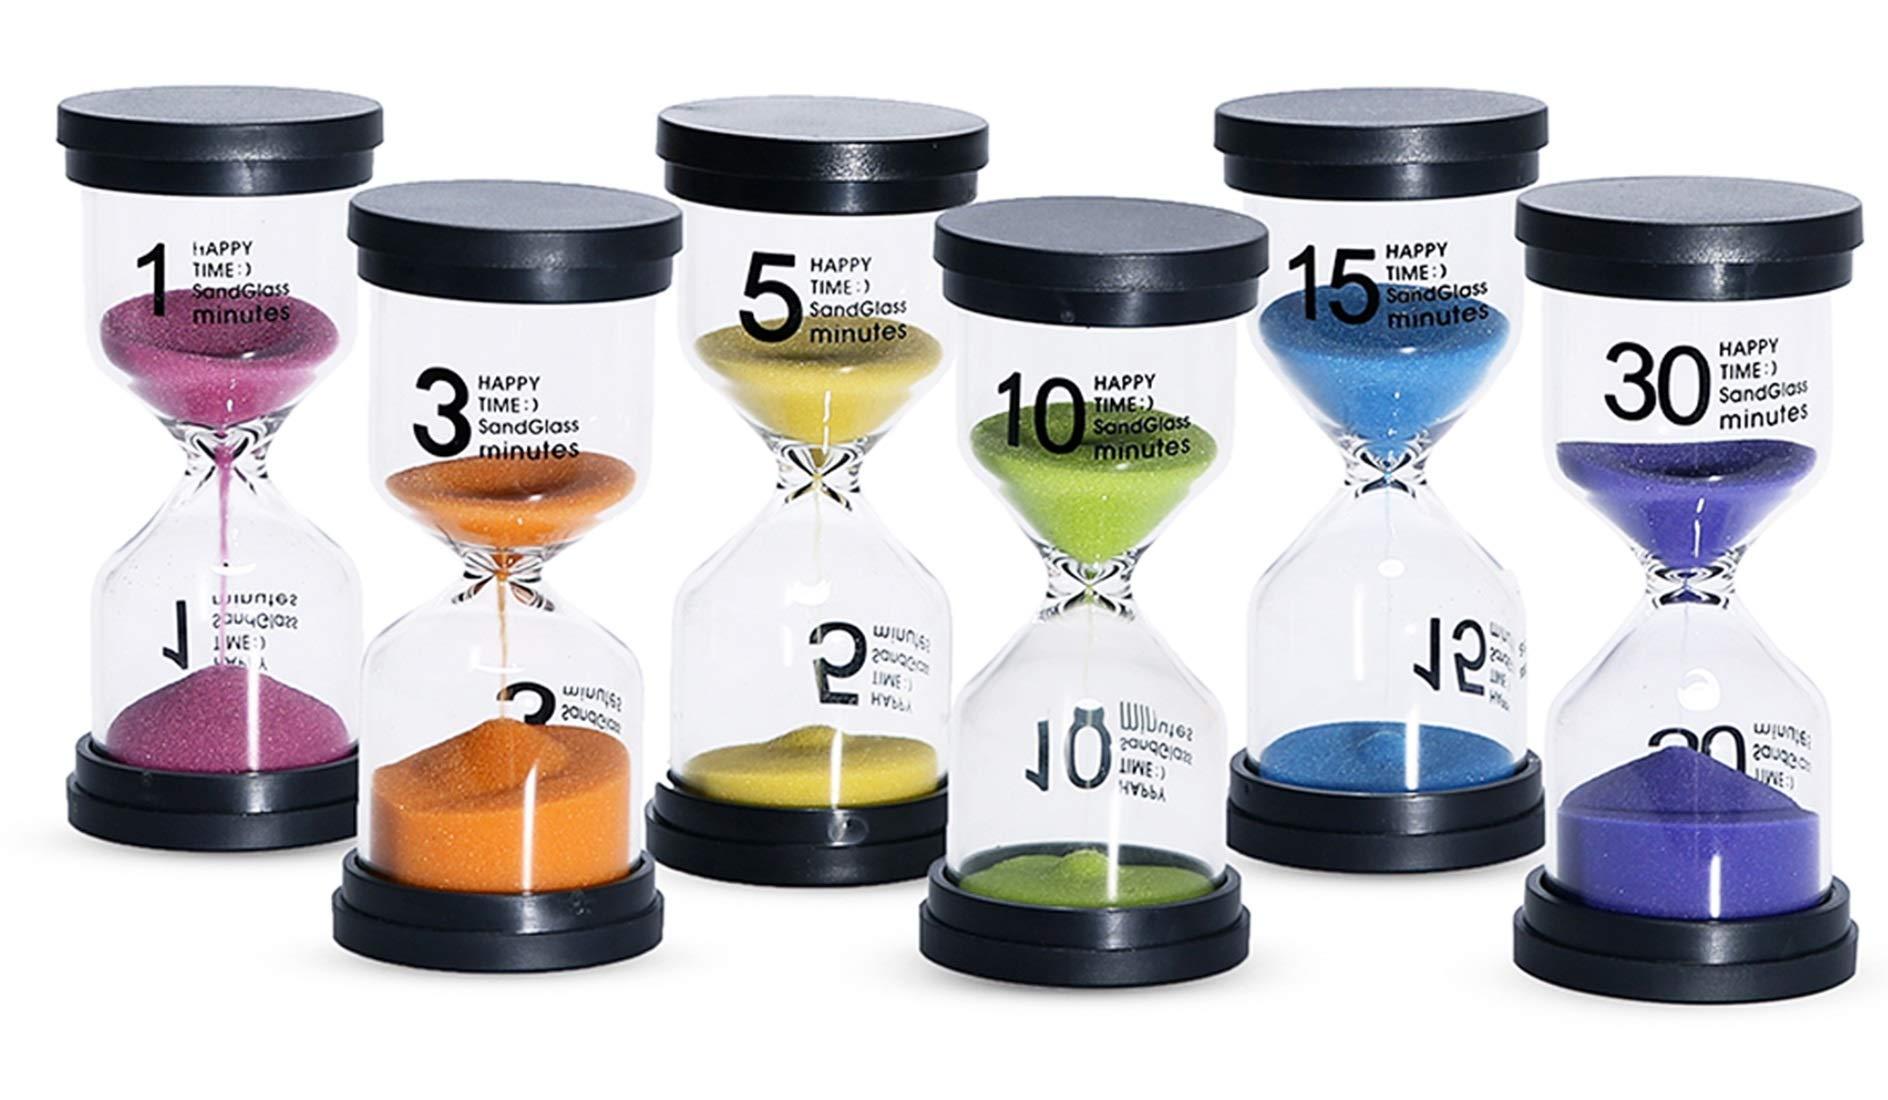 KSM UP Hourglass Sandglass Decoration